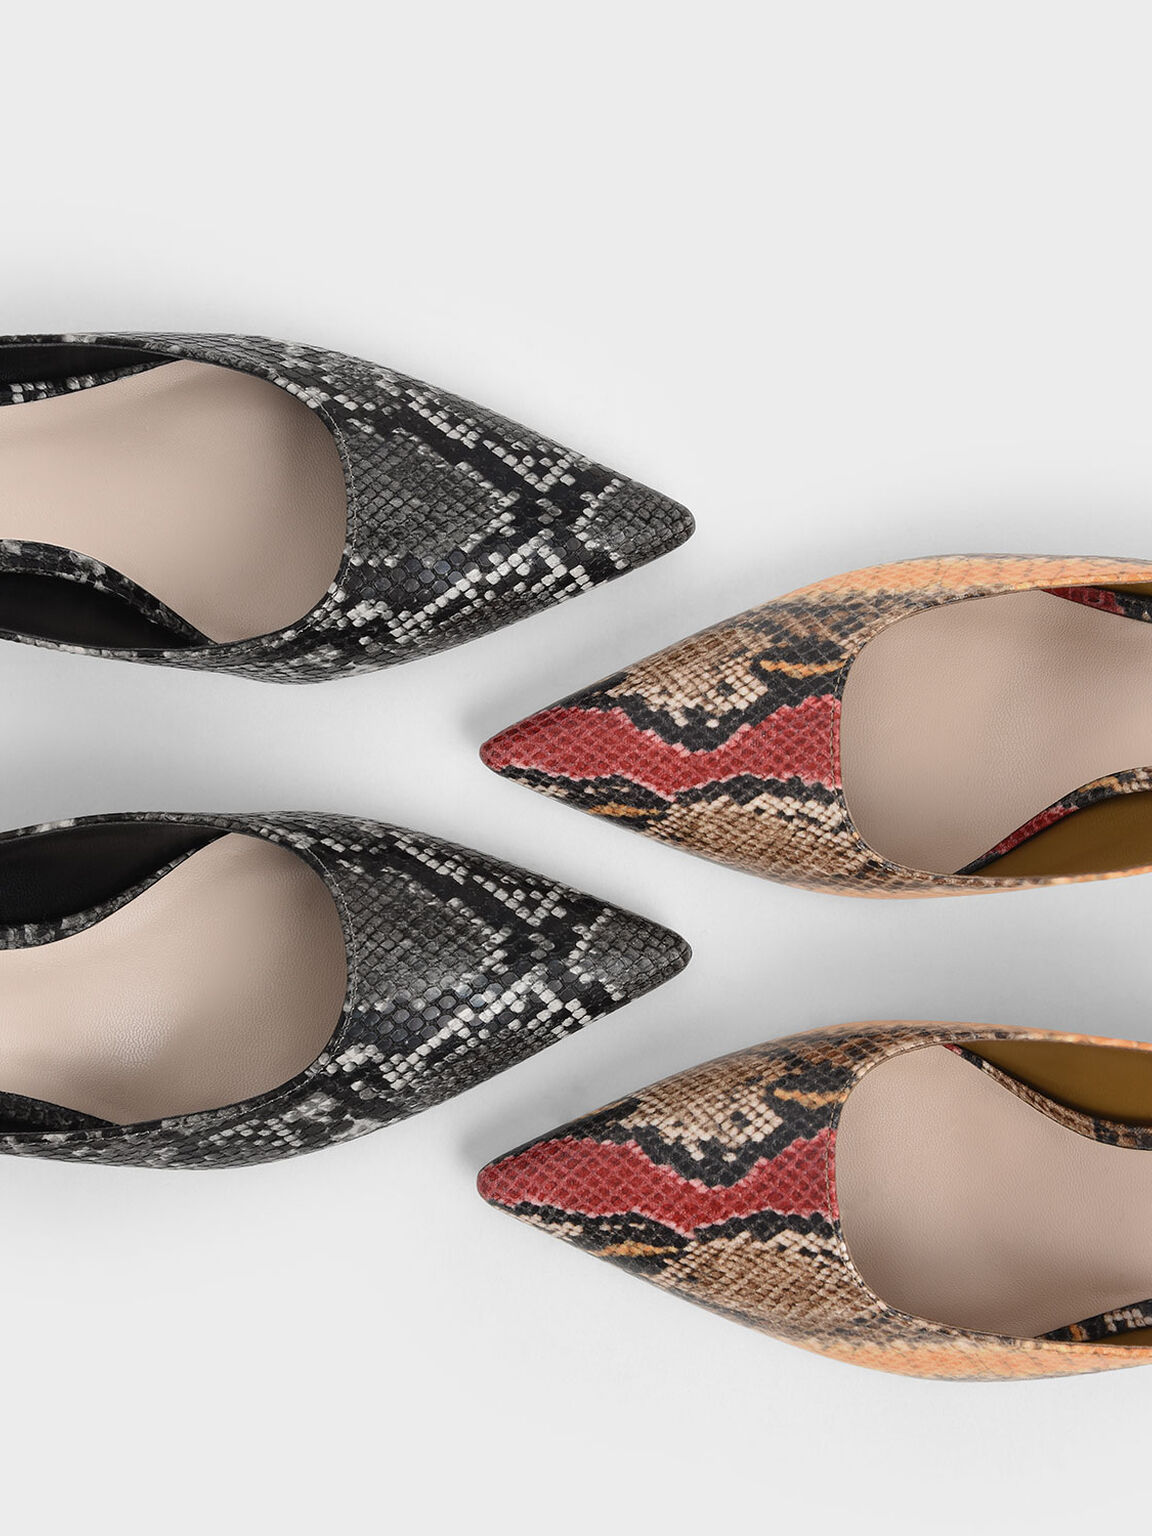 Snake Print Pointed Toe Kitten Heel Mules, Black Textured, hi-res